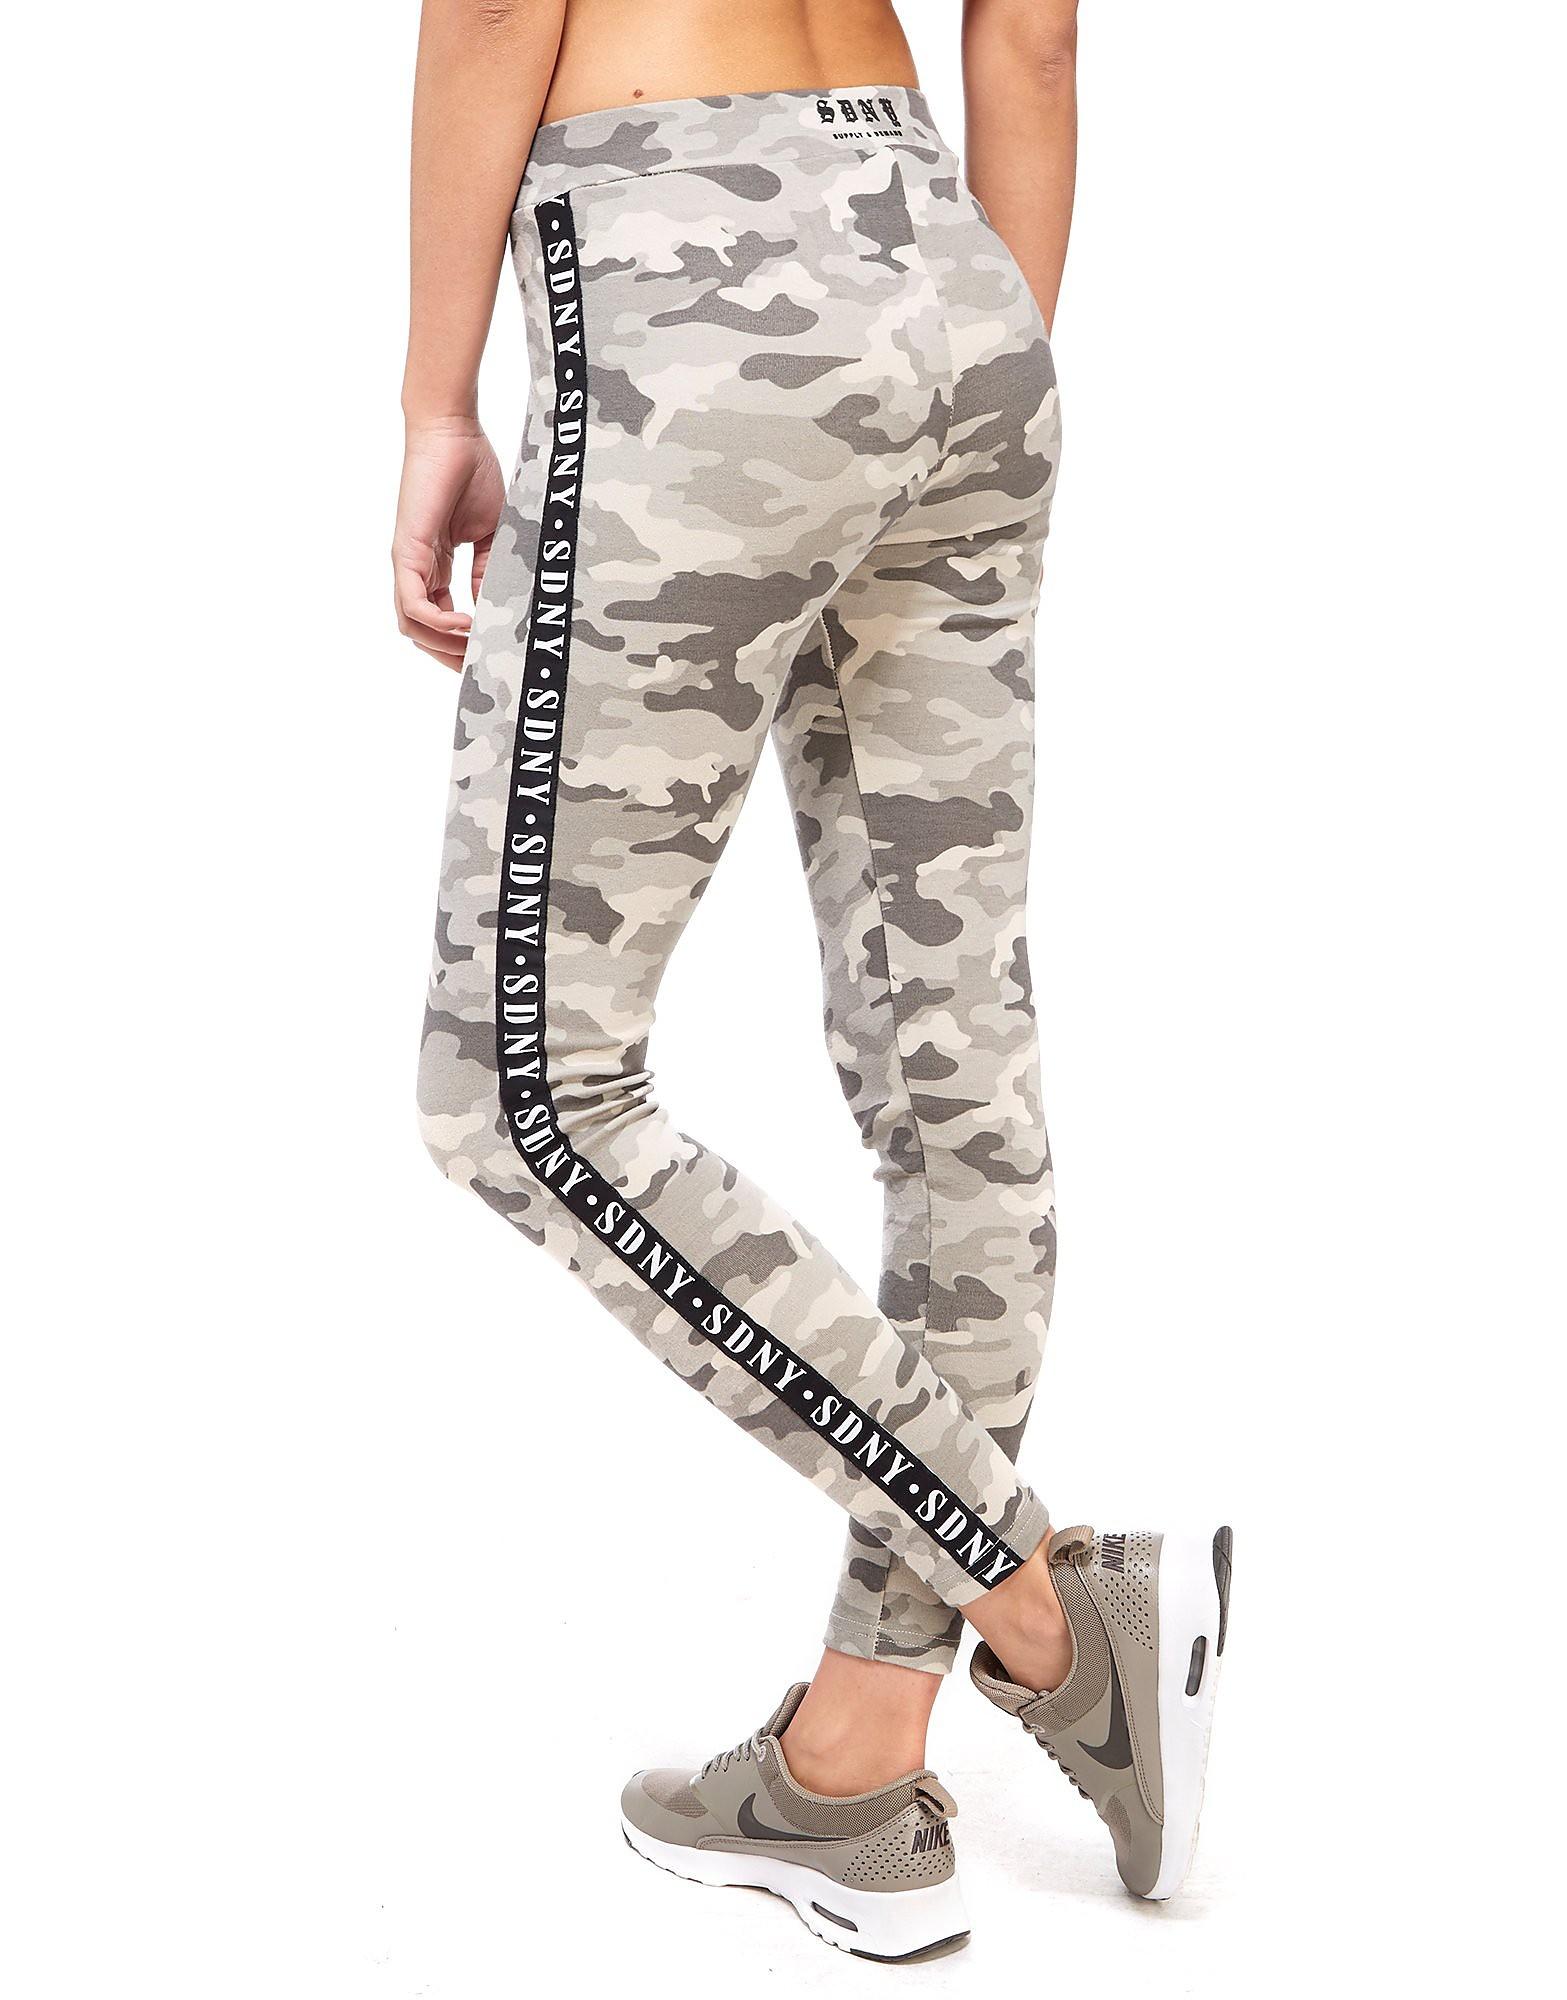 Supply & Demand Camo Leggings